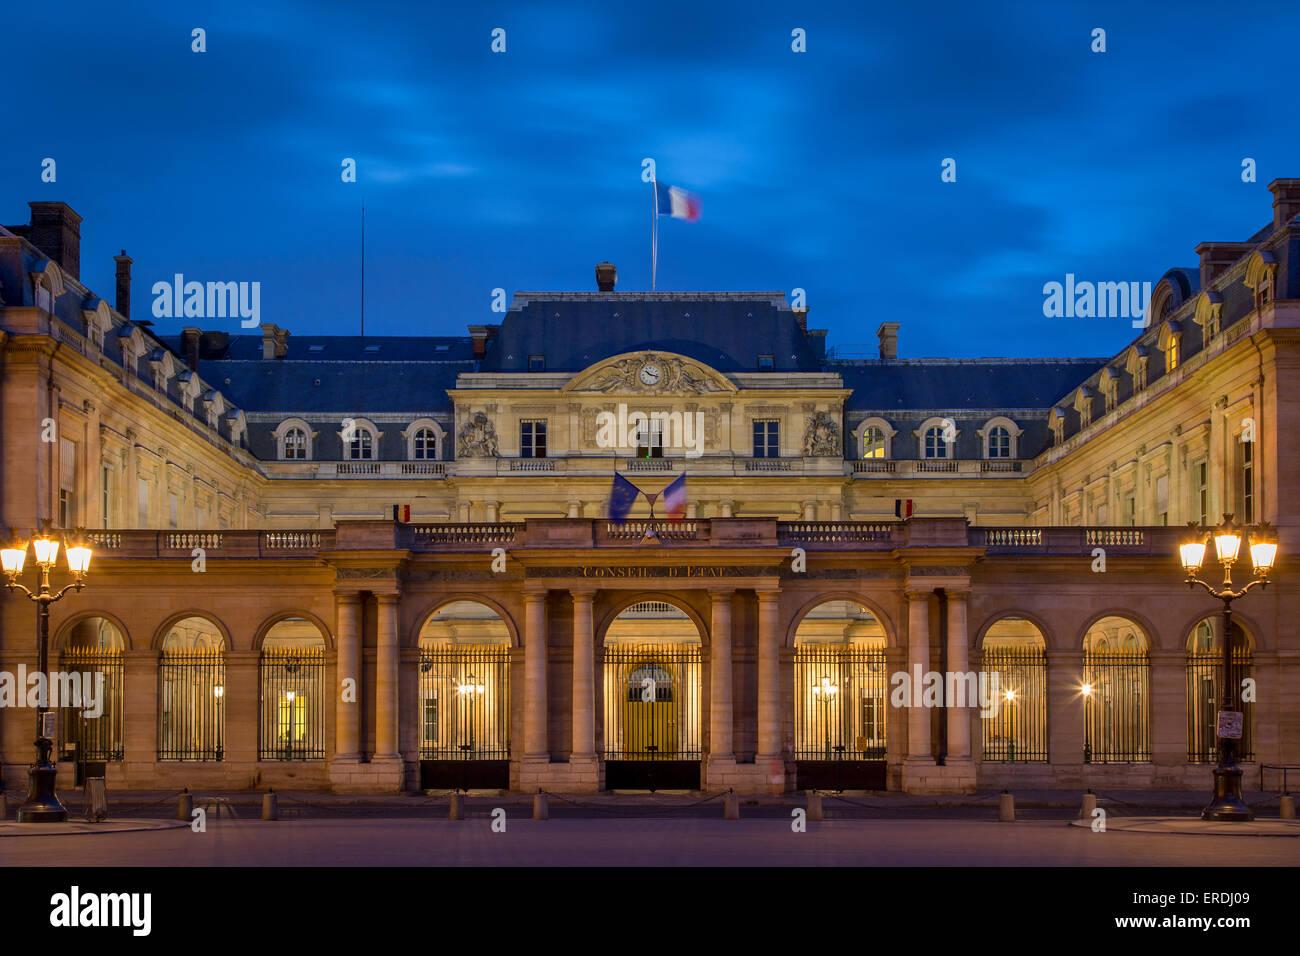 paris city gate stockfotos paris city gate bilder alamy. Black Bedroom Furniture Sets. Home Design Ideas